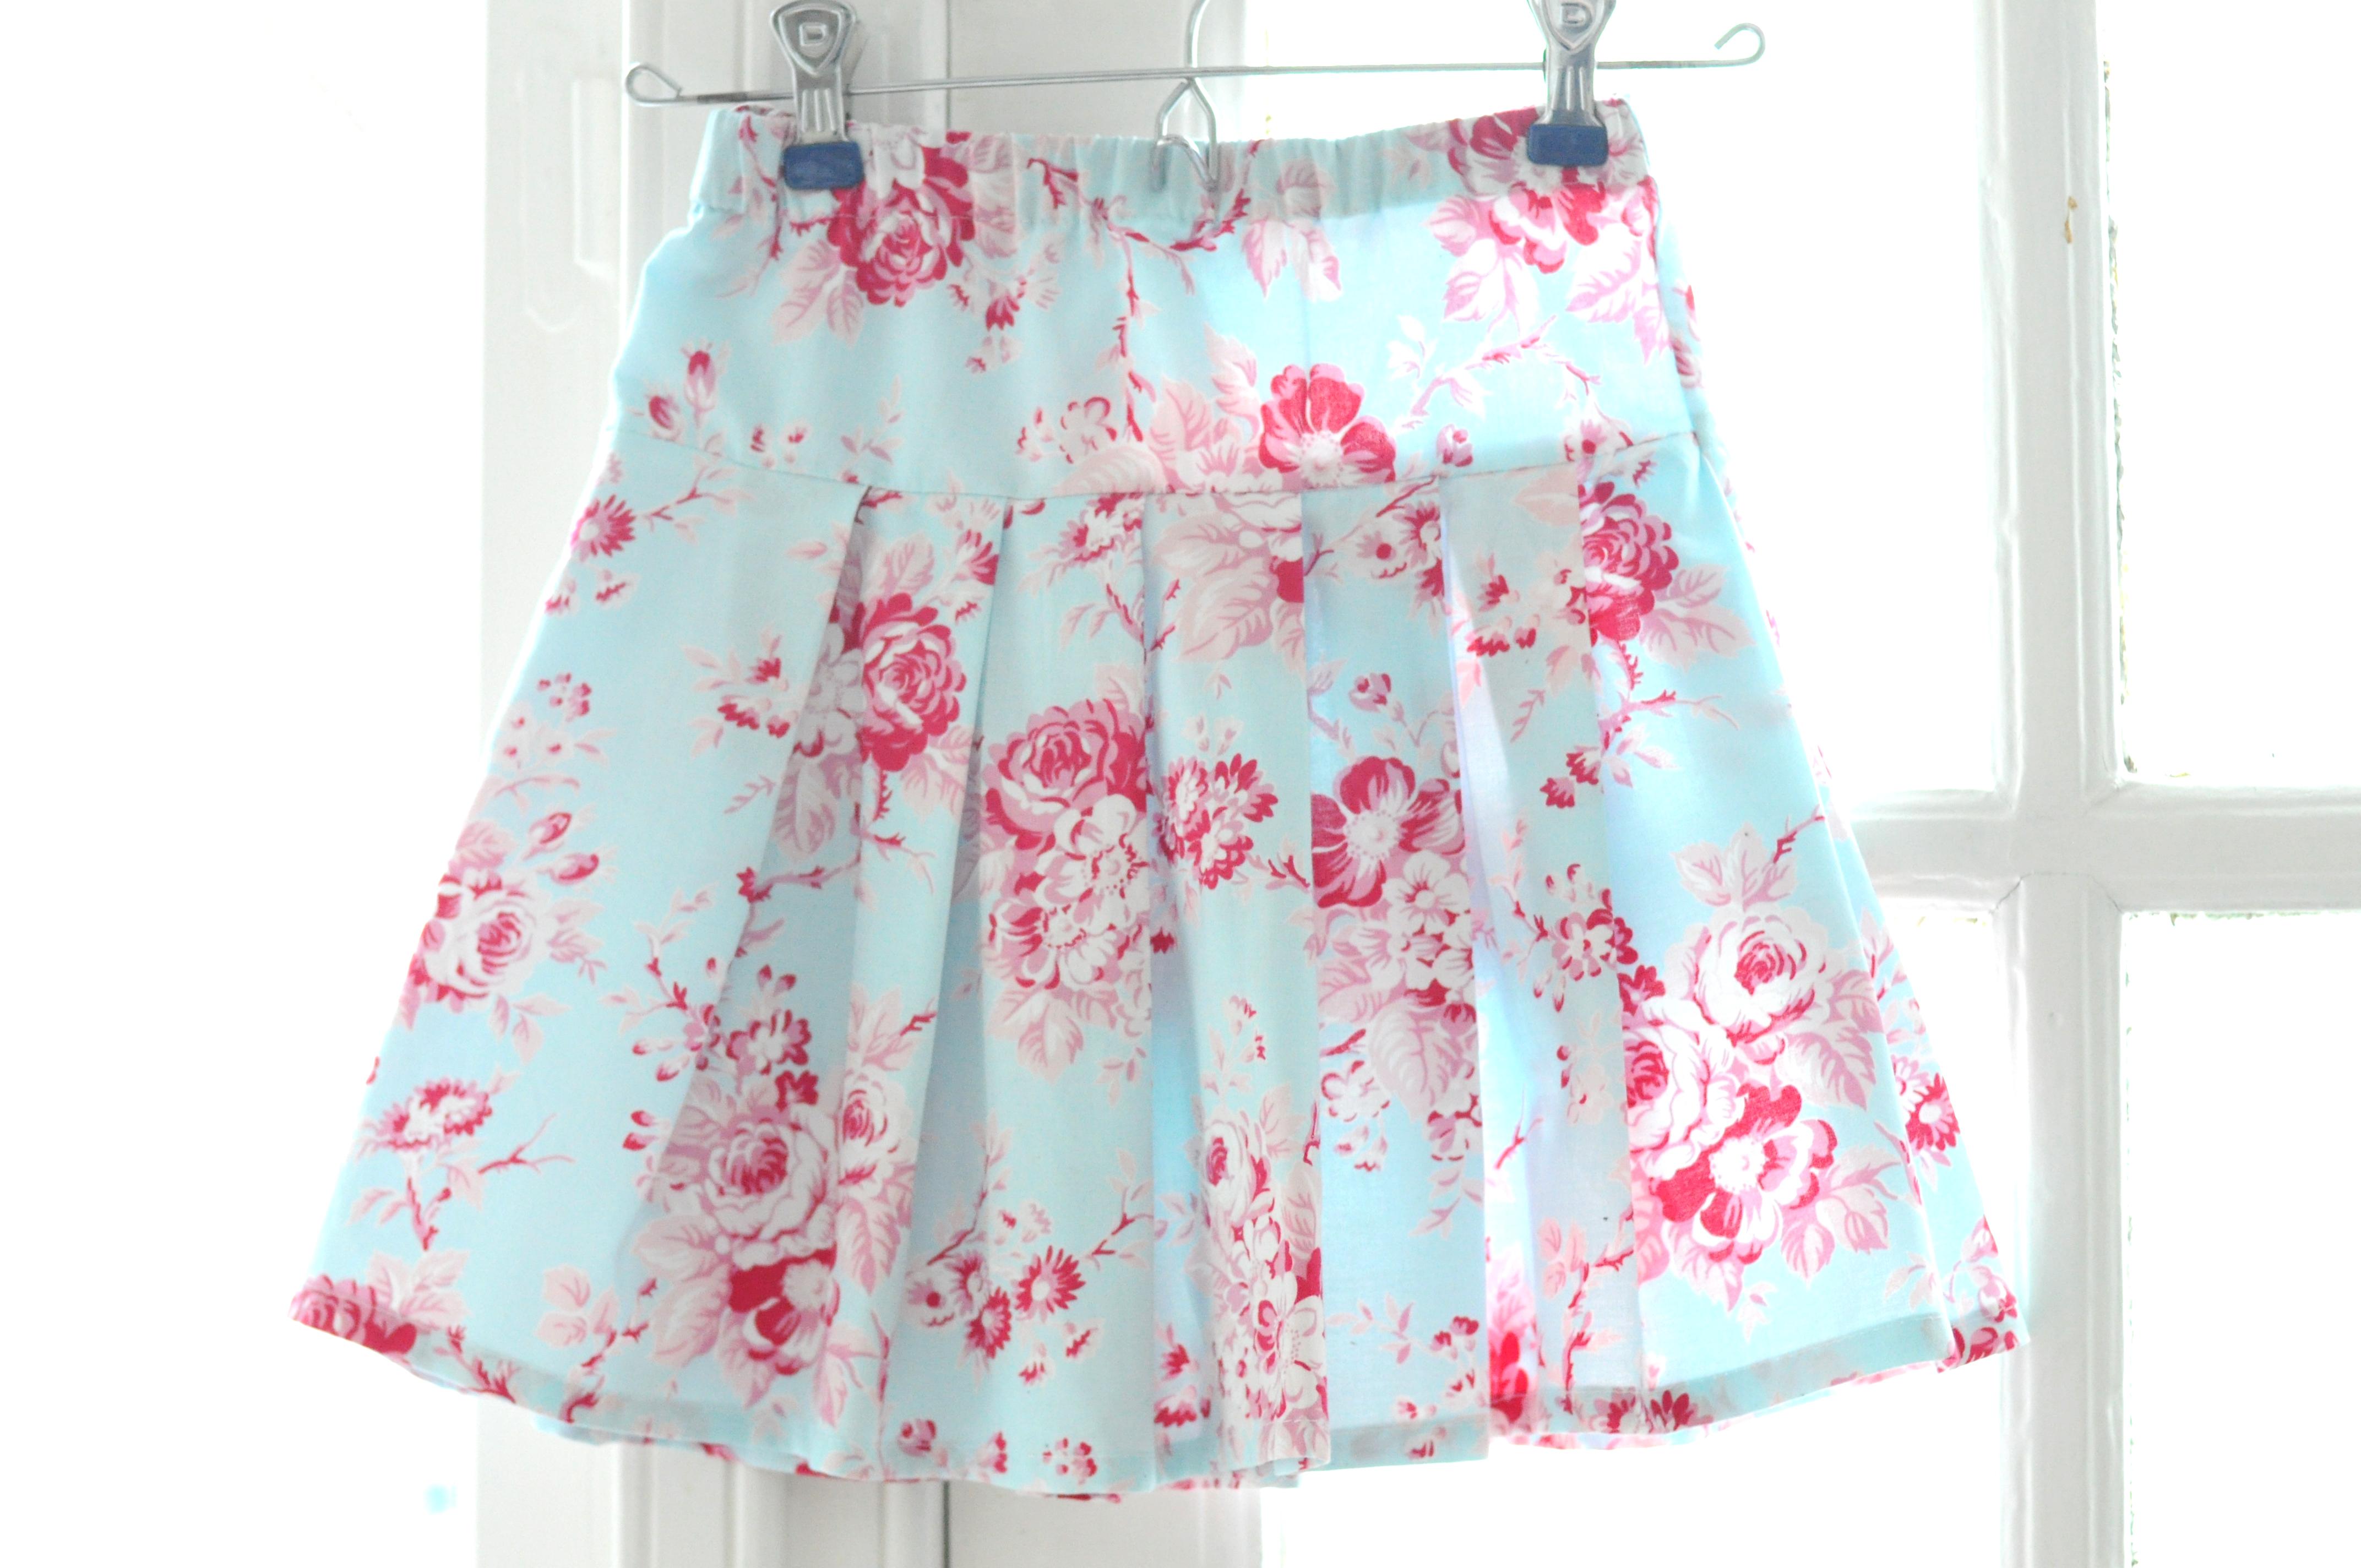 Grand revival designs easy peasy pleated skirt tutorial easy peasy pleated skirt tutorial jeuxipadfo Gallery